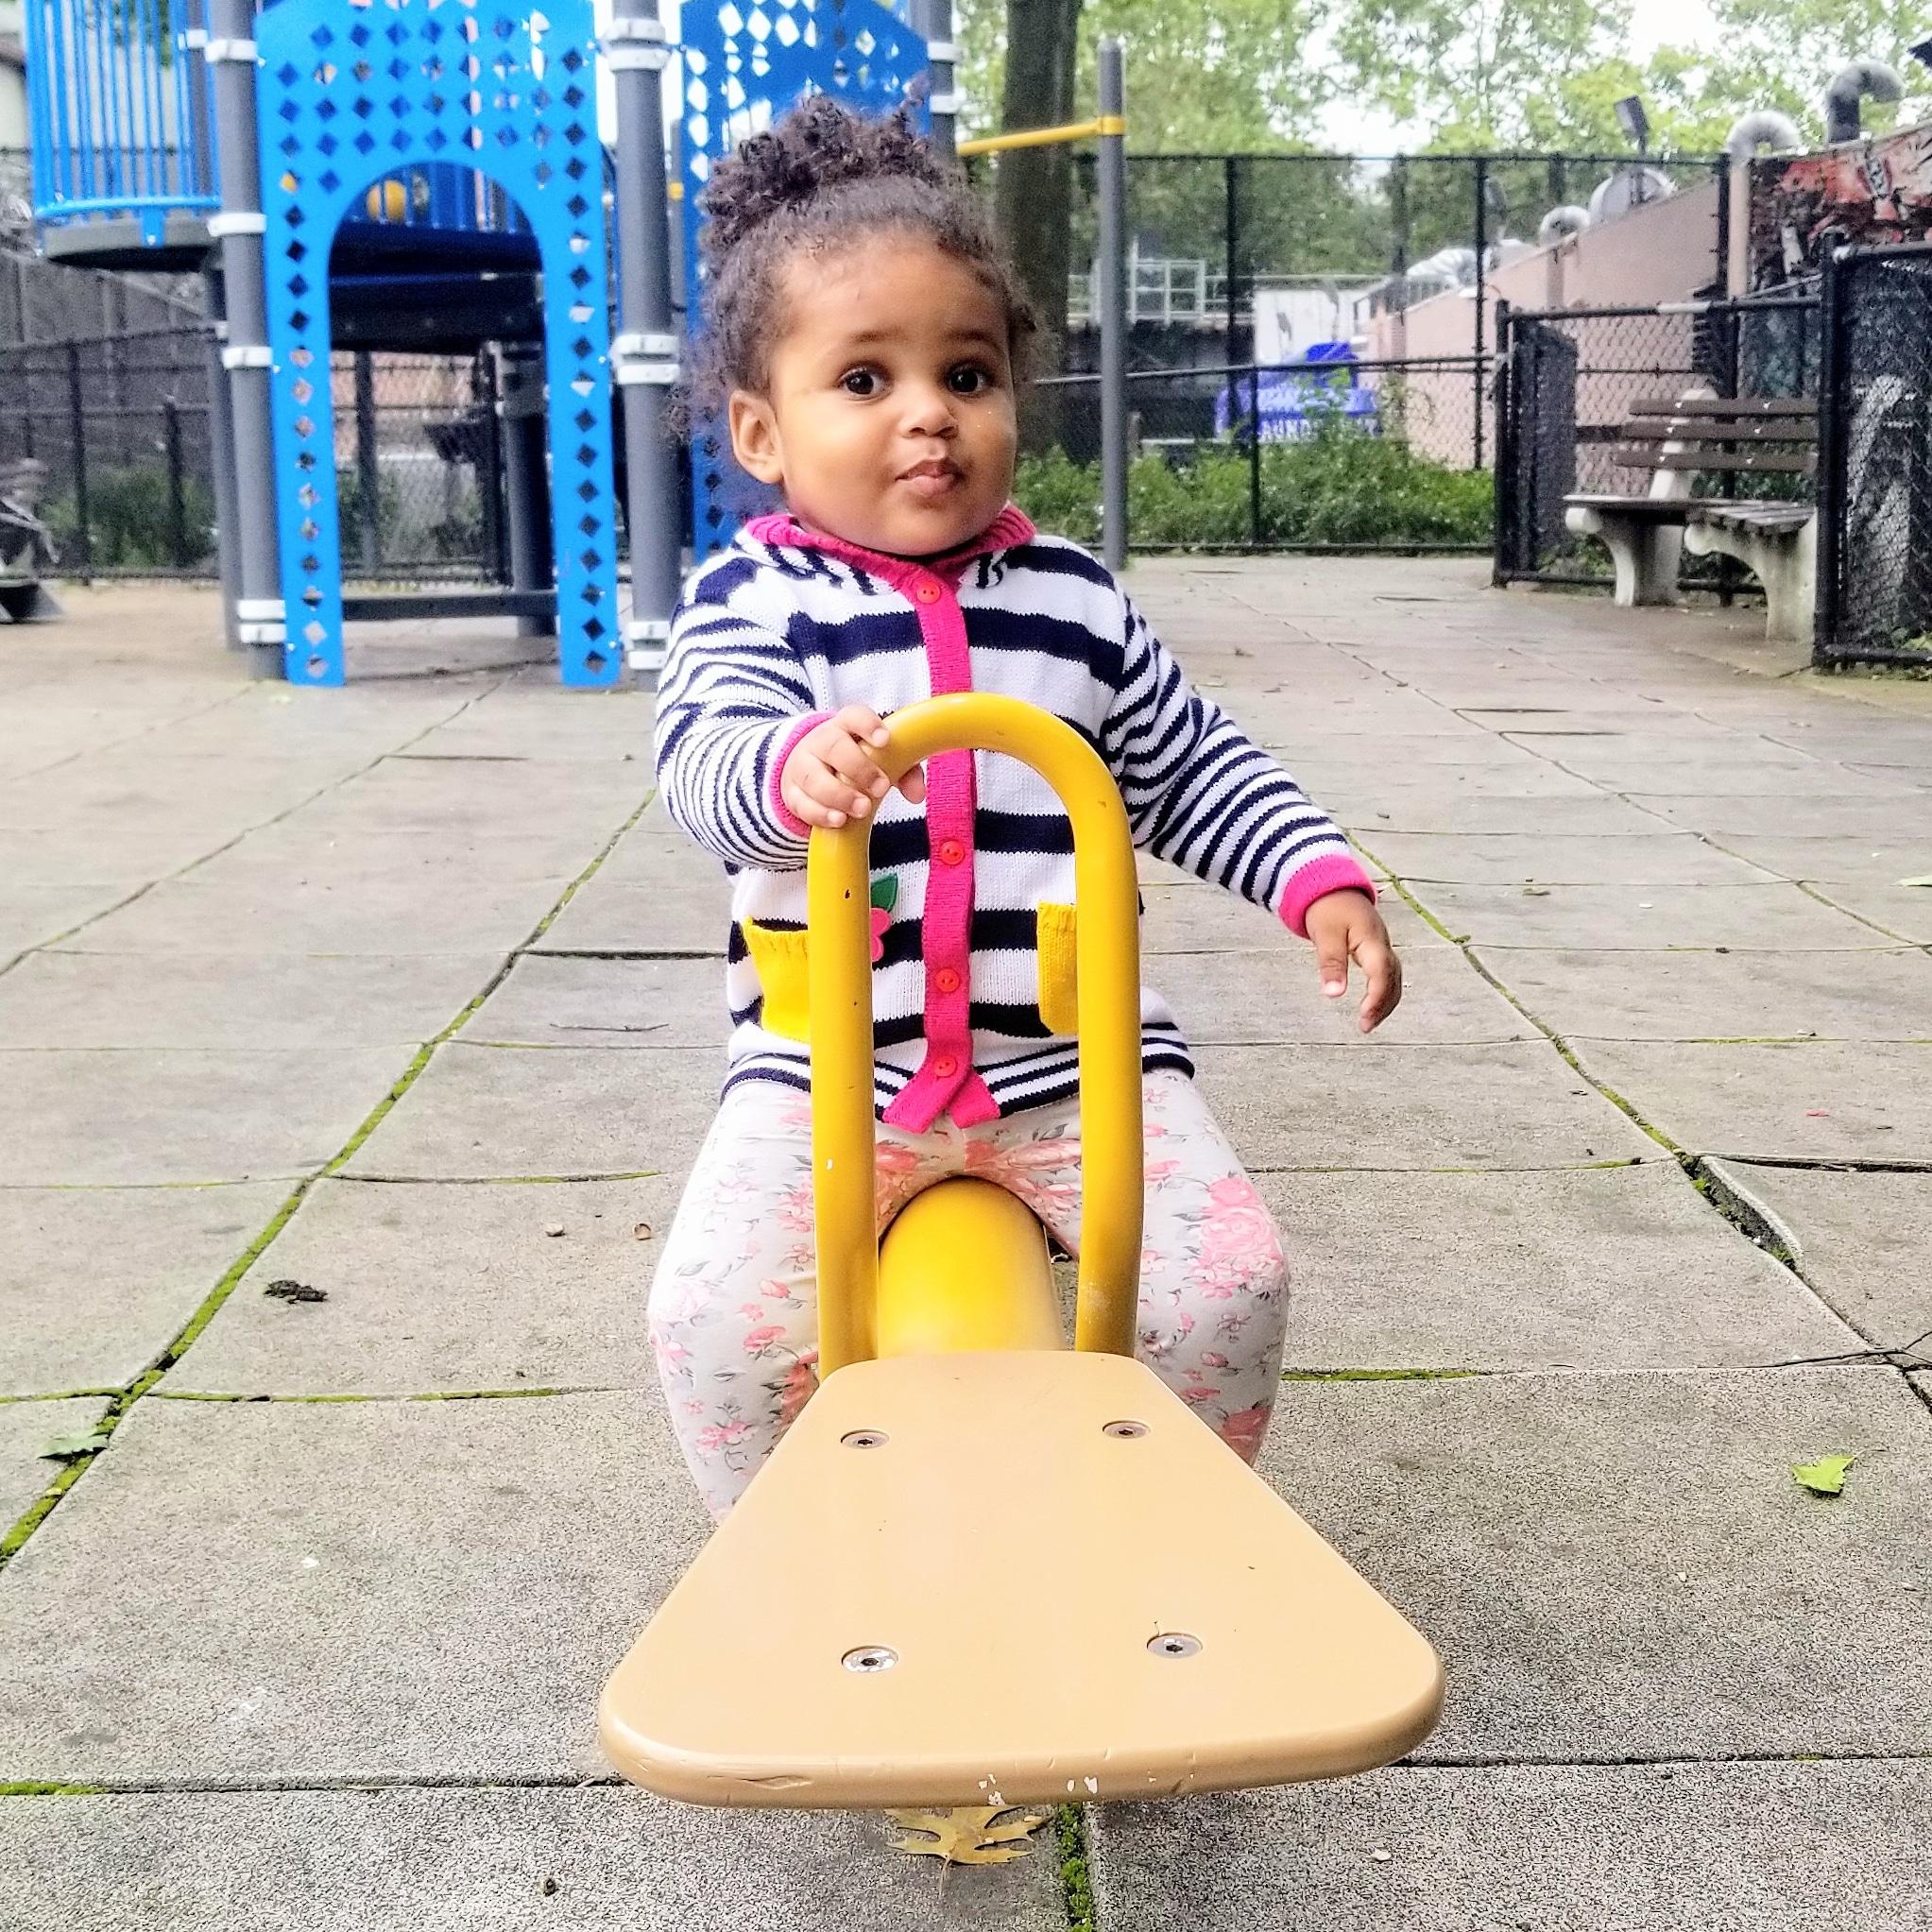 Free Fun: New York City Public Parks